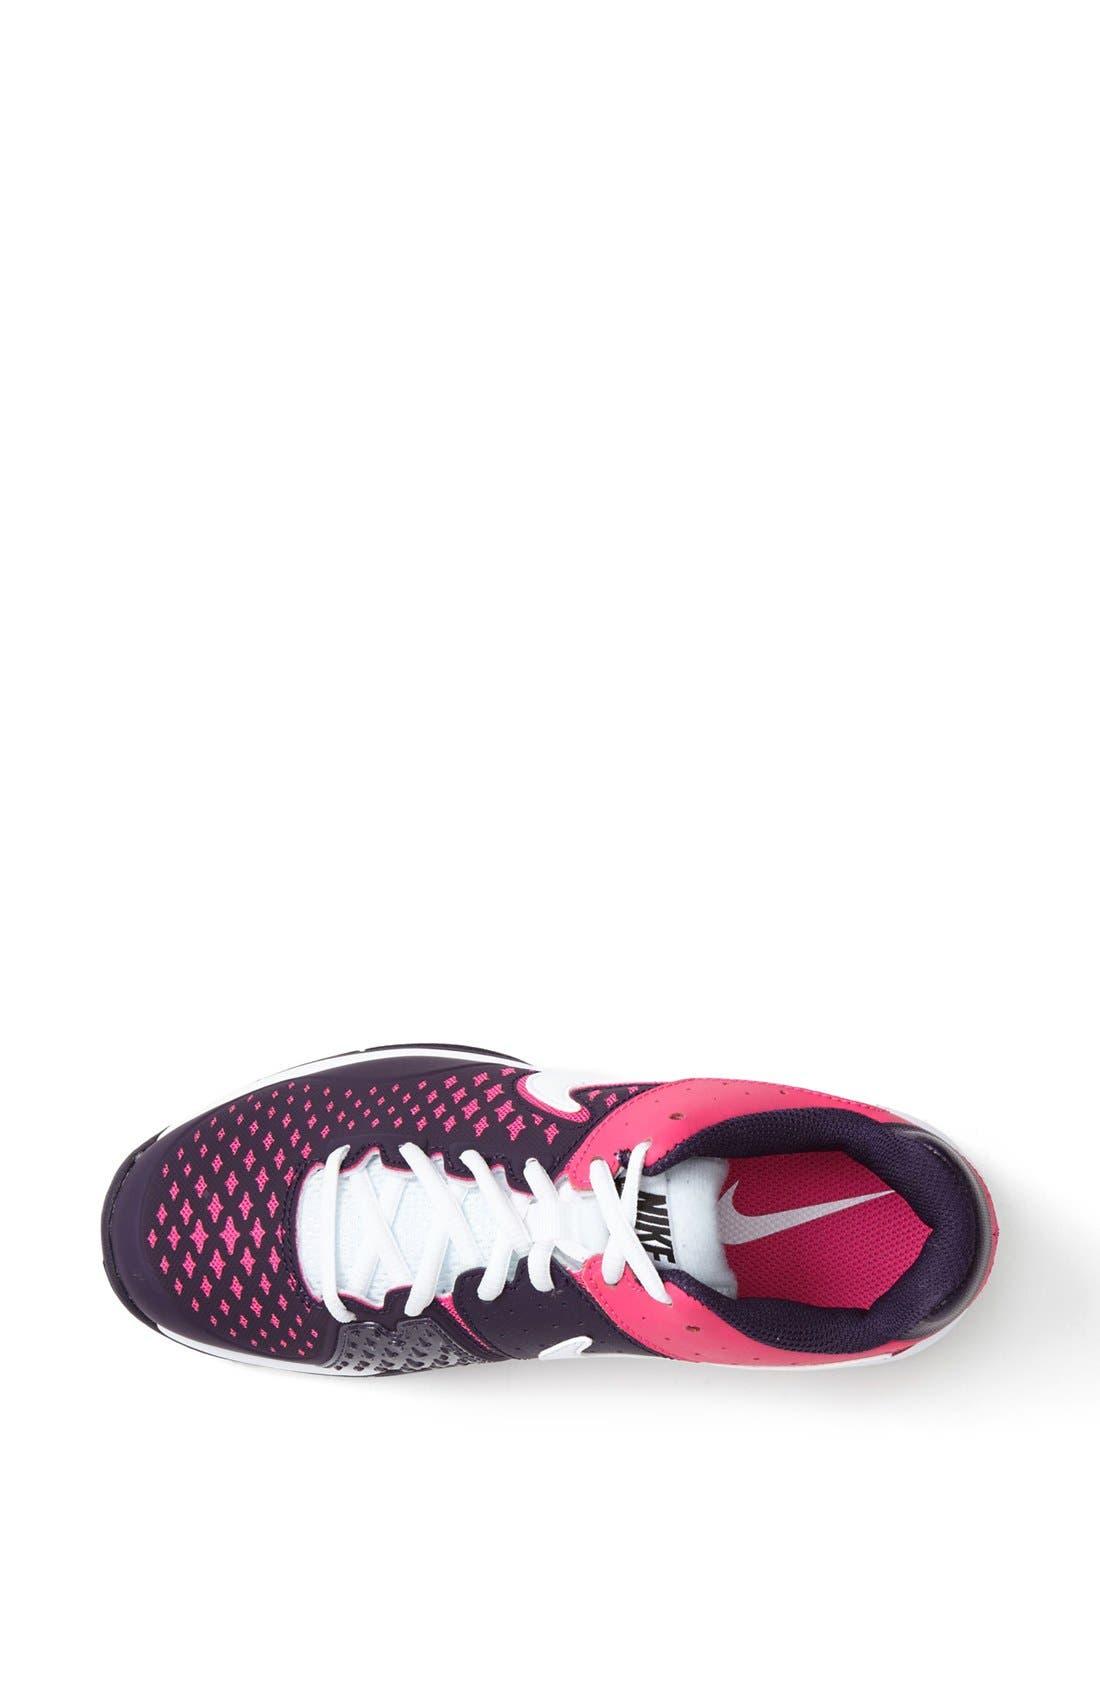 Alternate Image 3  - Nike 'Air Cage Advantage' Tennis Shoe (Women)